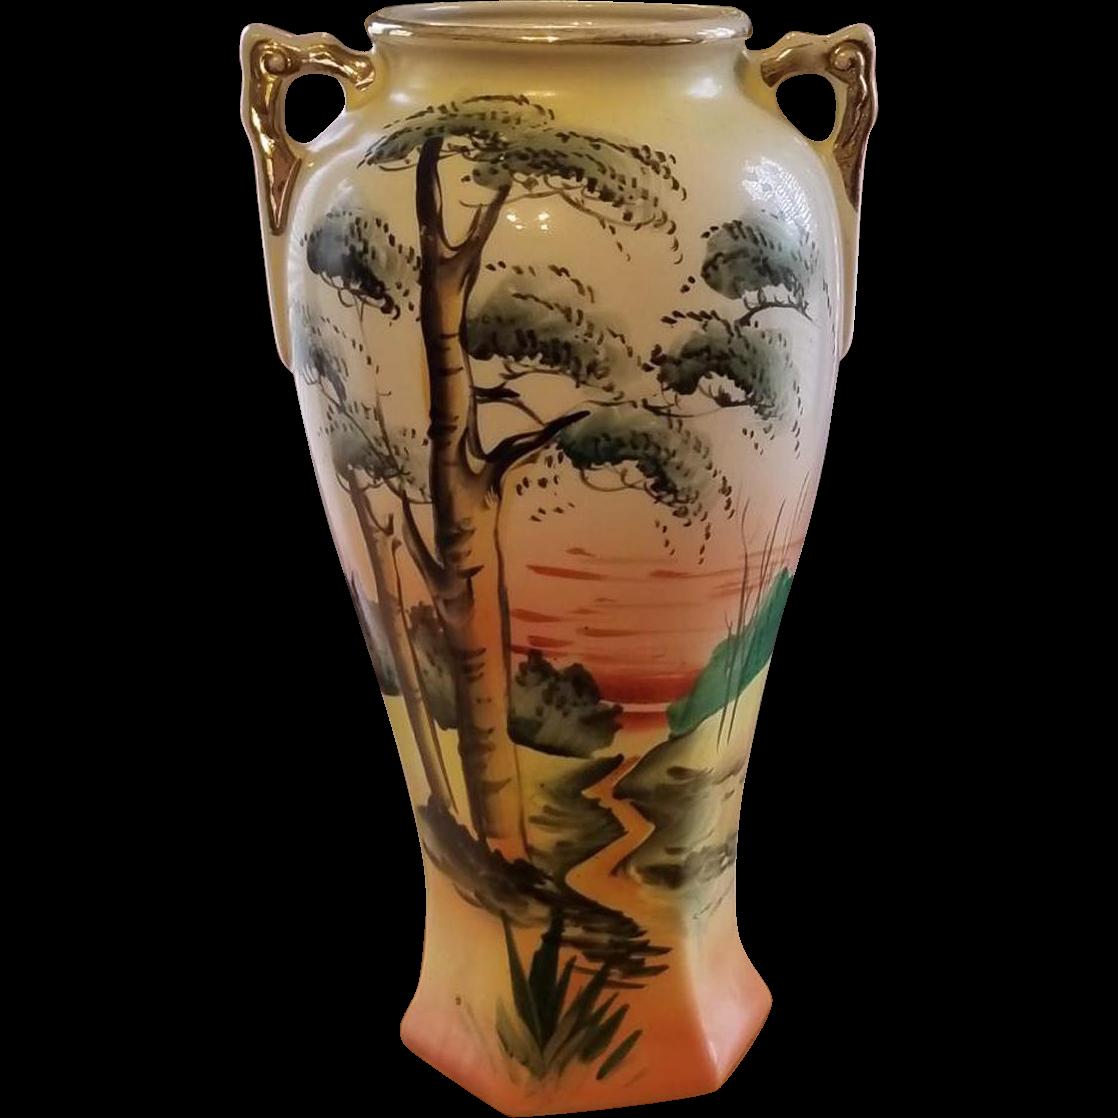 Vintage Royal Nishiki Japan hand painted bonsai tree porcelain ceramic vase urn with eared handles